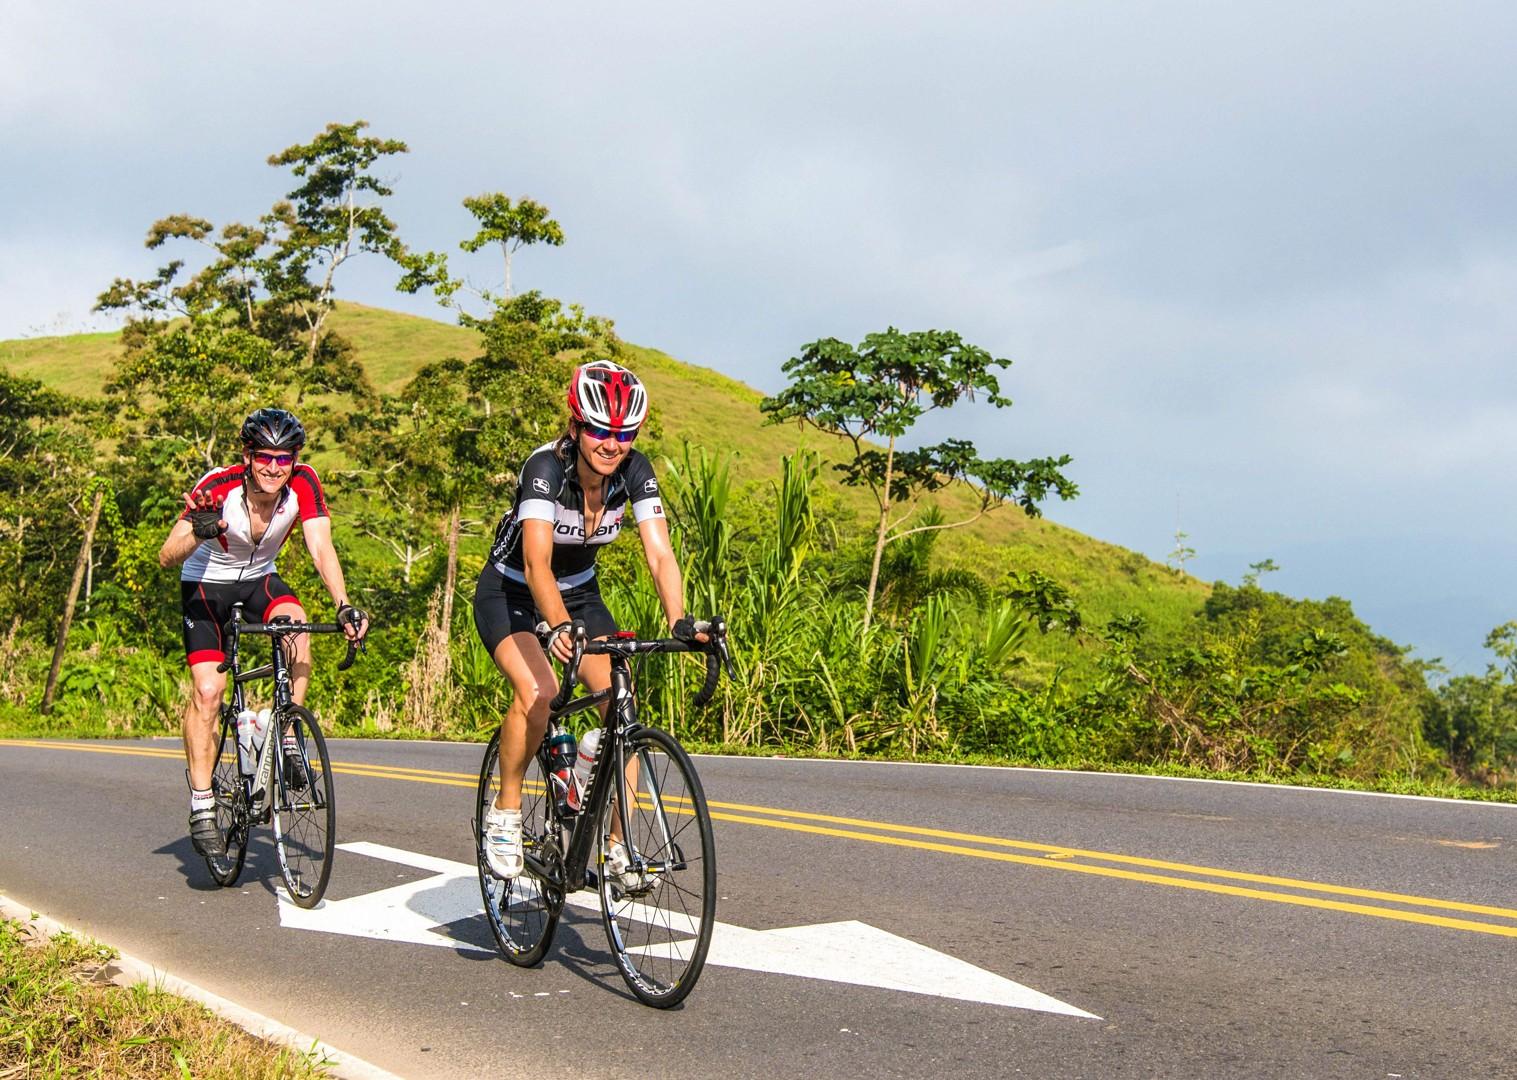 dsc_2784_24442586095_o.jpg - Costa Rica - Ruta de los Volcanes - Road Cycling